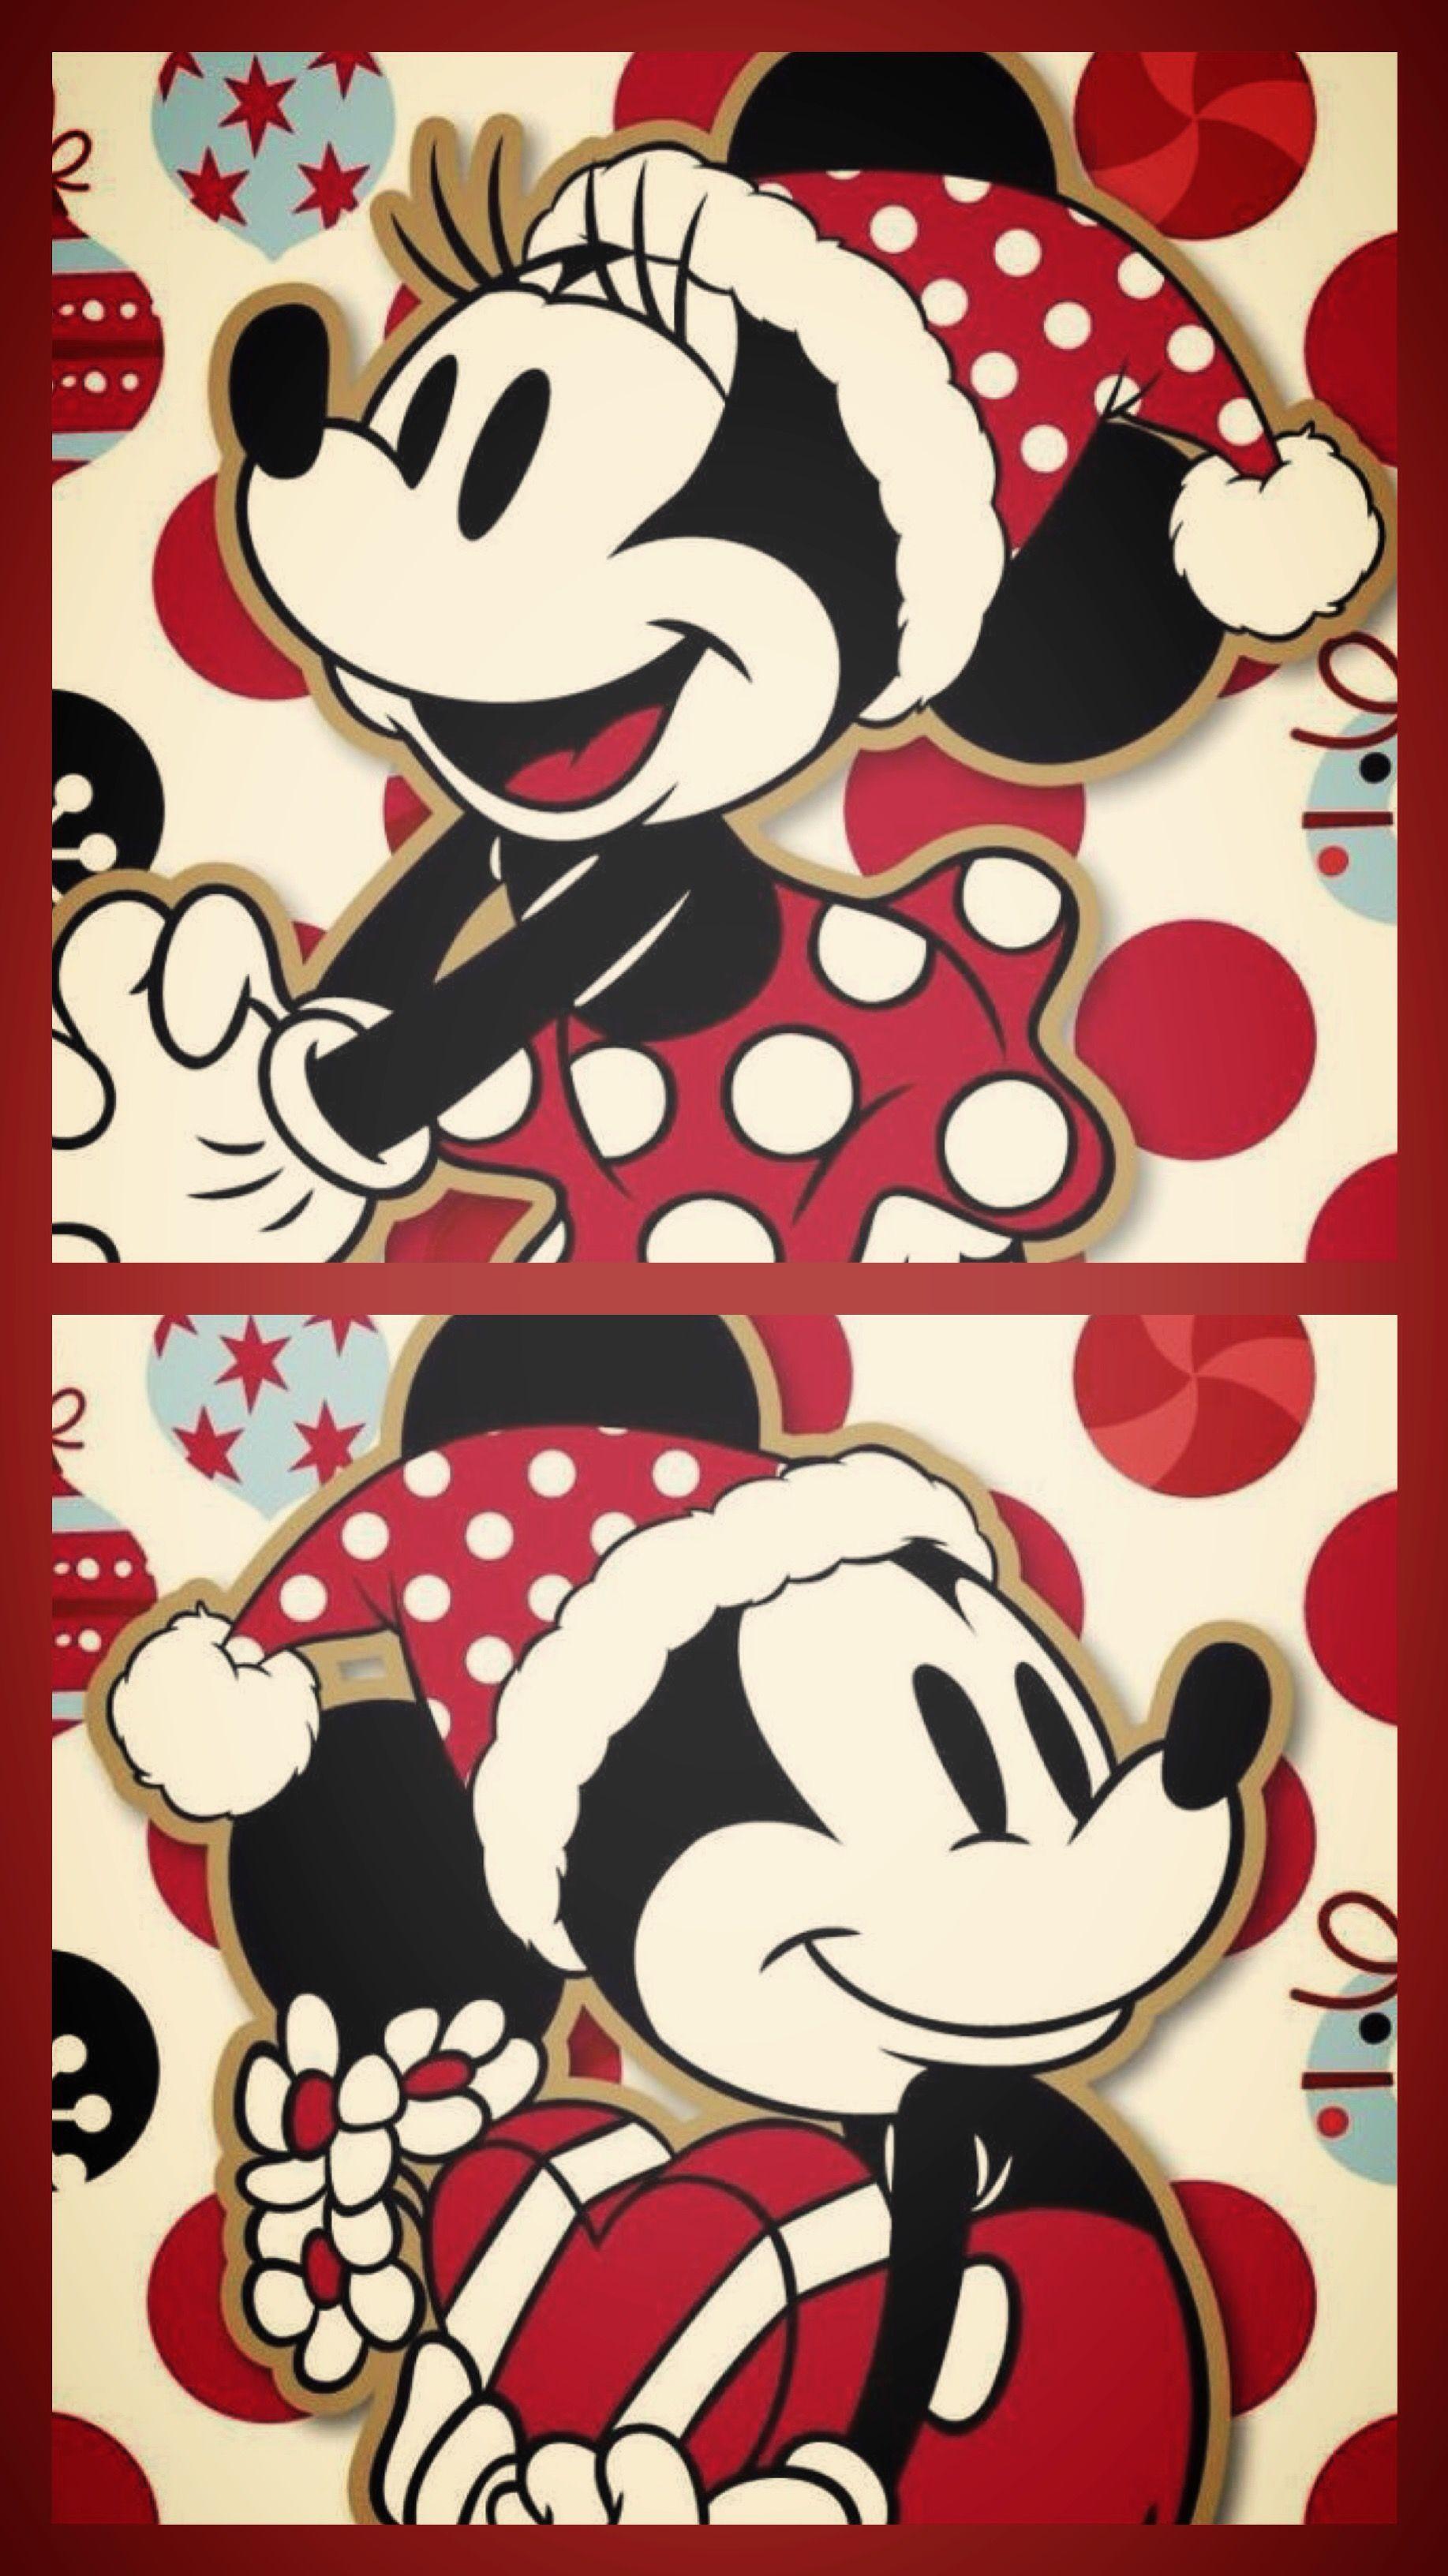 Mickey Minnie Christmas Wallpaper Wallpaper Iphone Christmas Wallpaper Iphone Disney Mickey Mouse Wallpaper